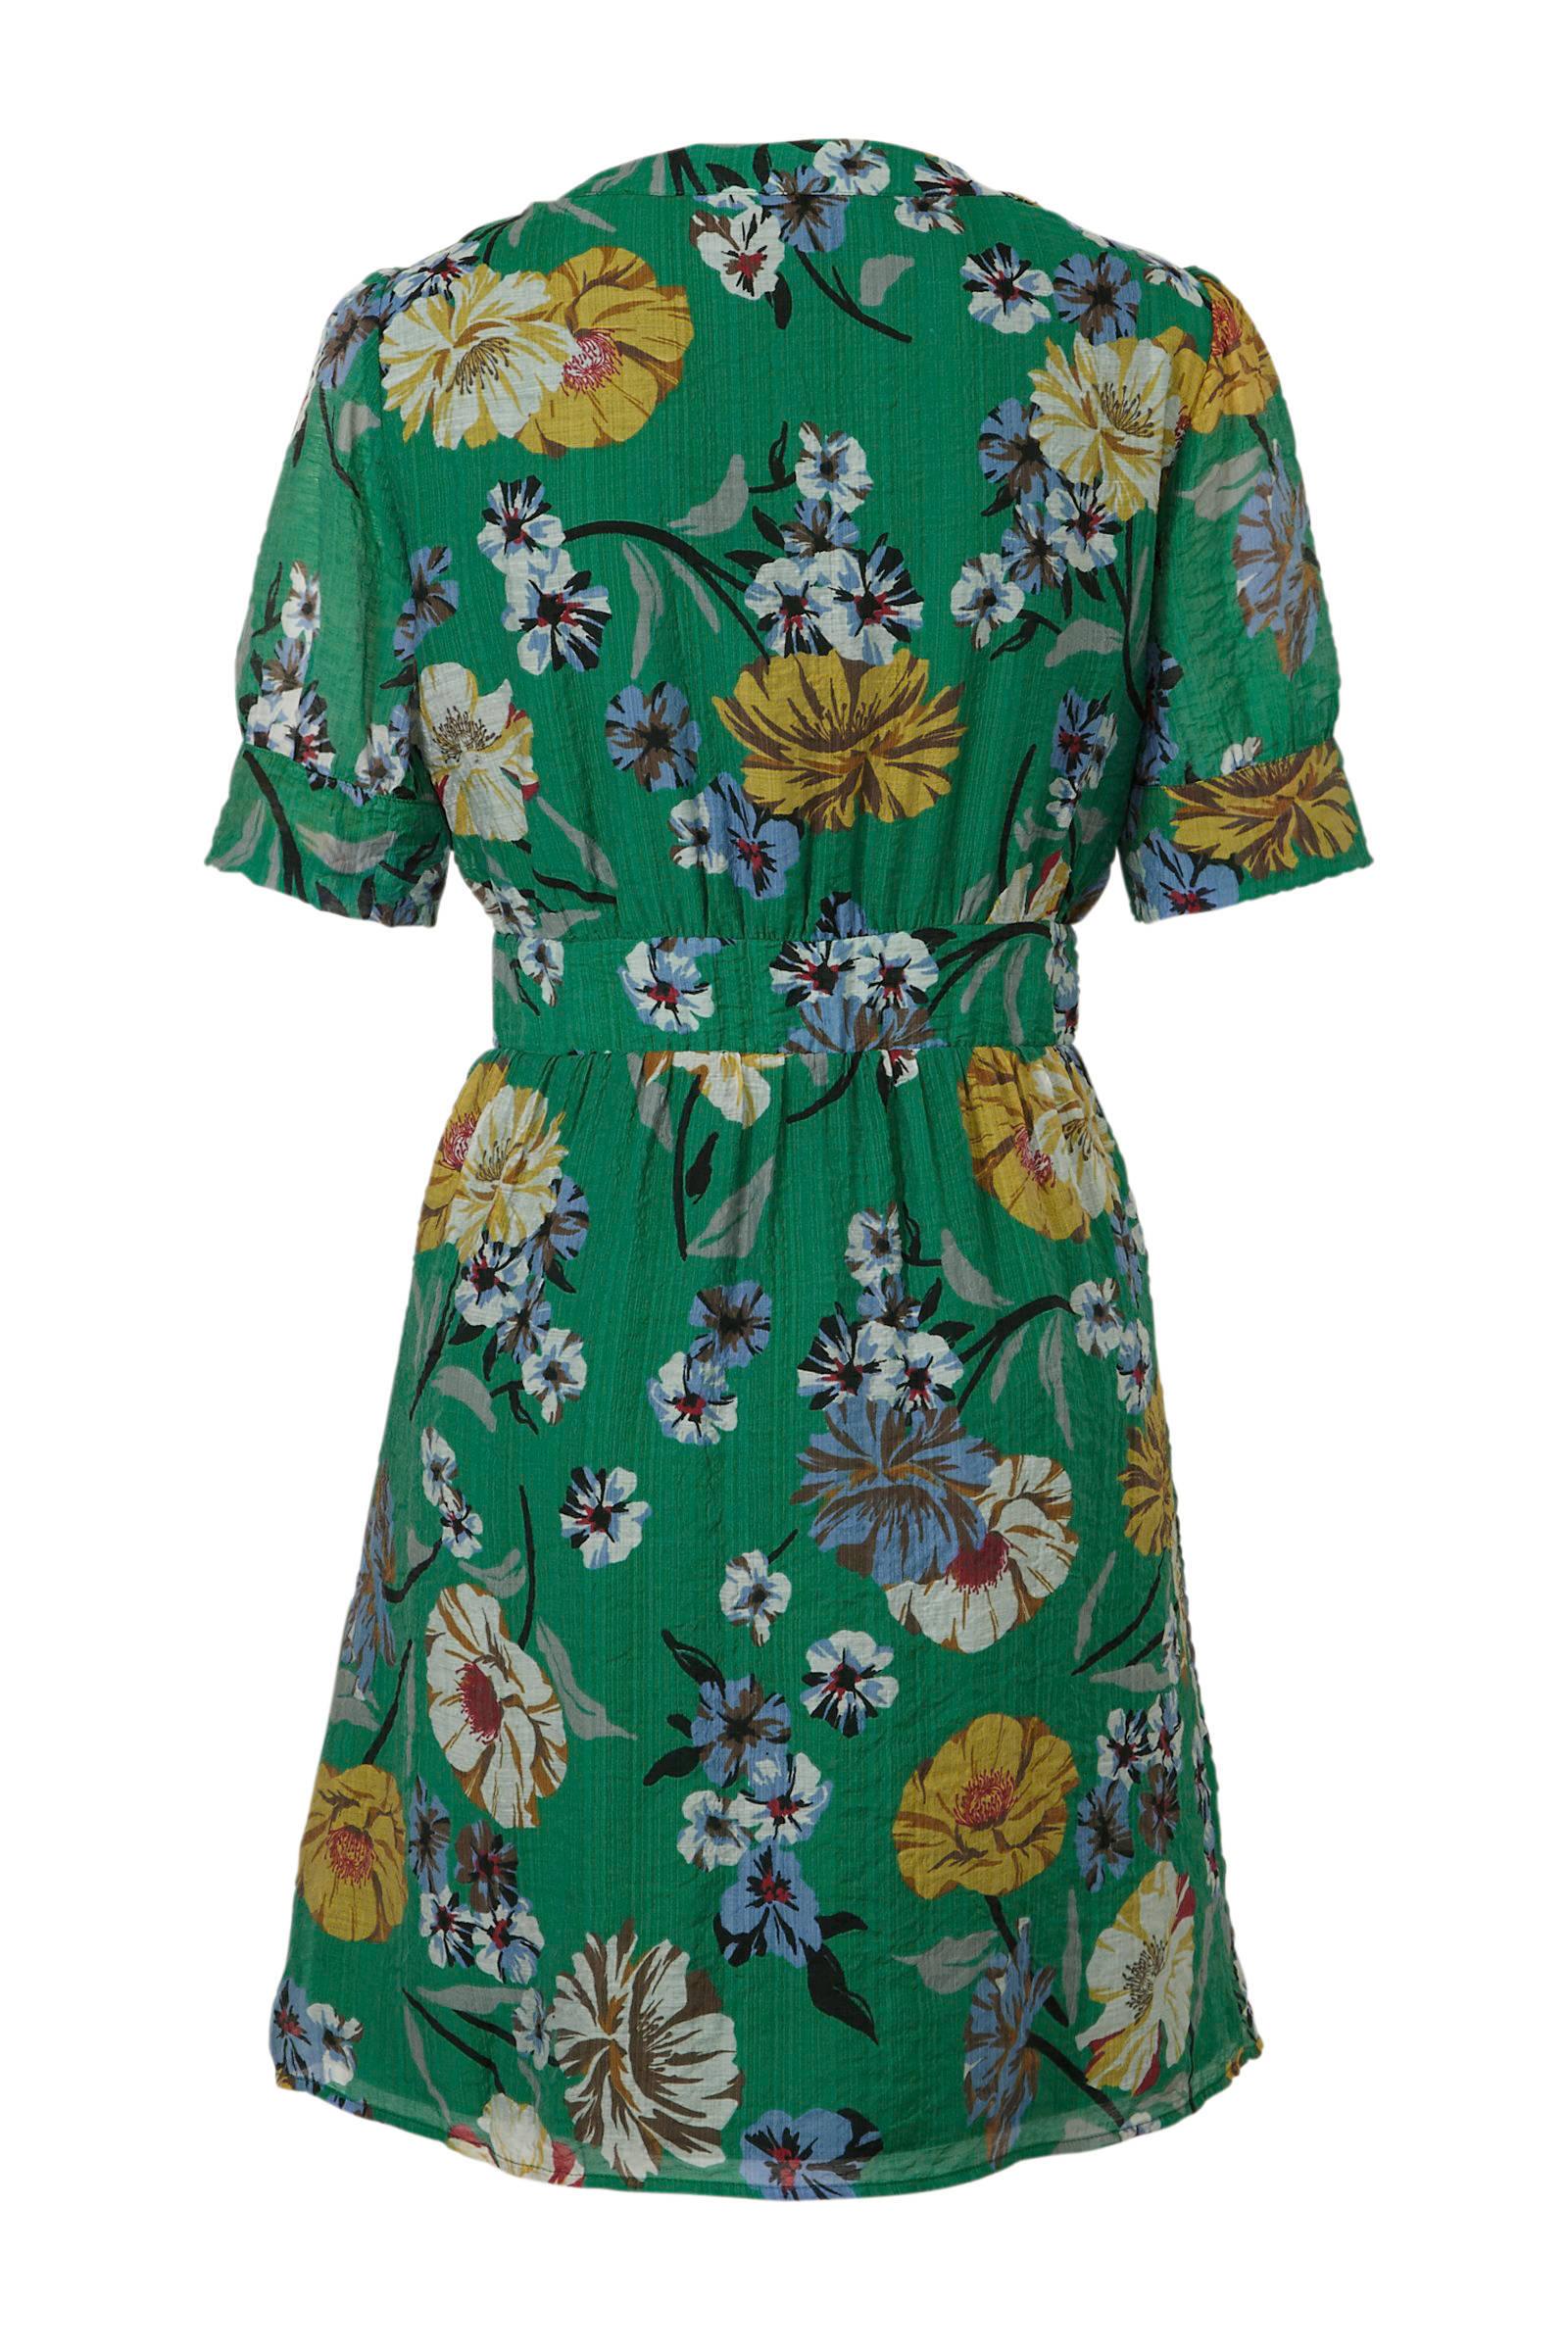 VILA bloemenprint met met VILA VILA jurk bloemenprint jurk jurk nfqxOXXRd